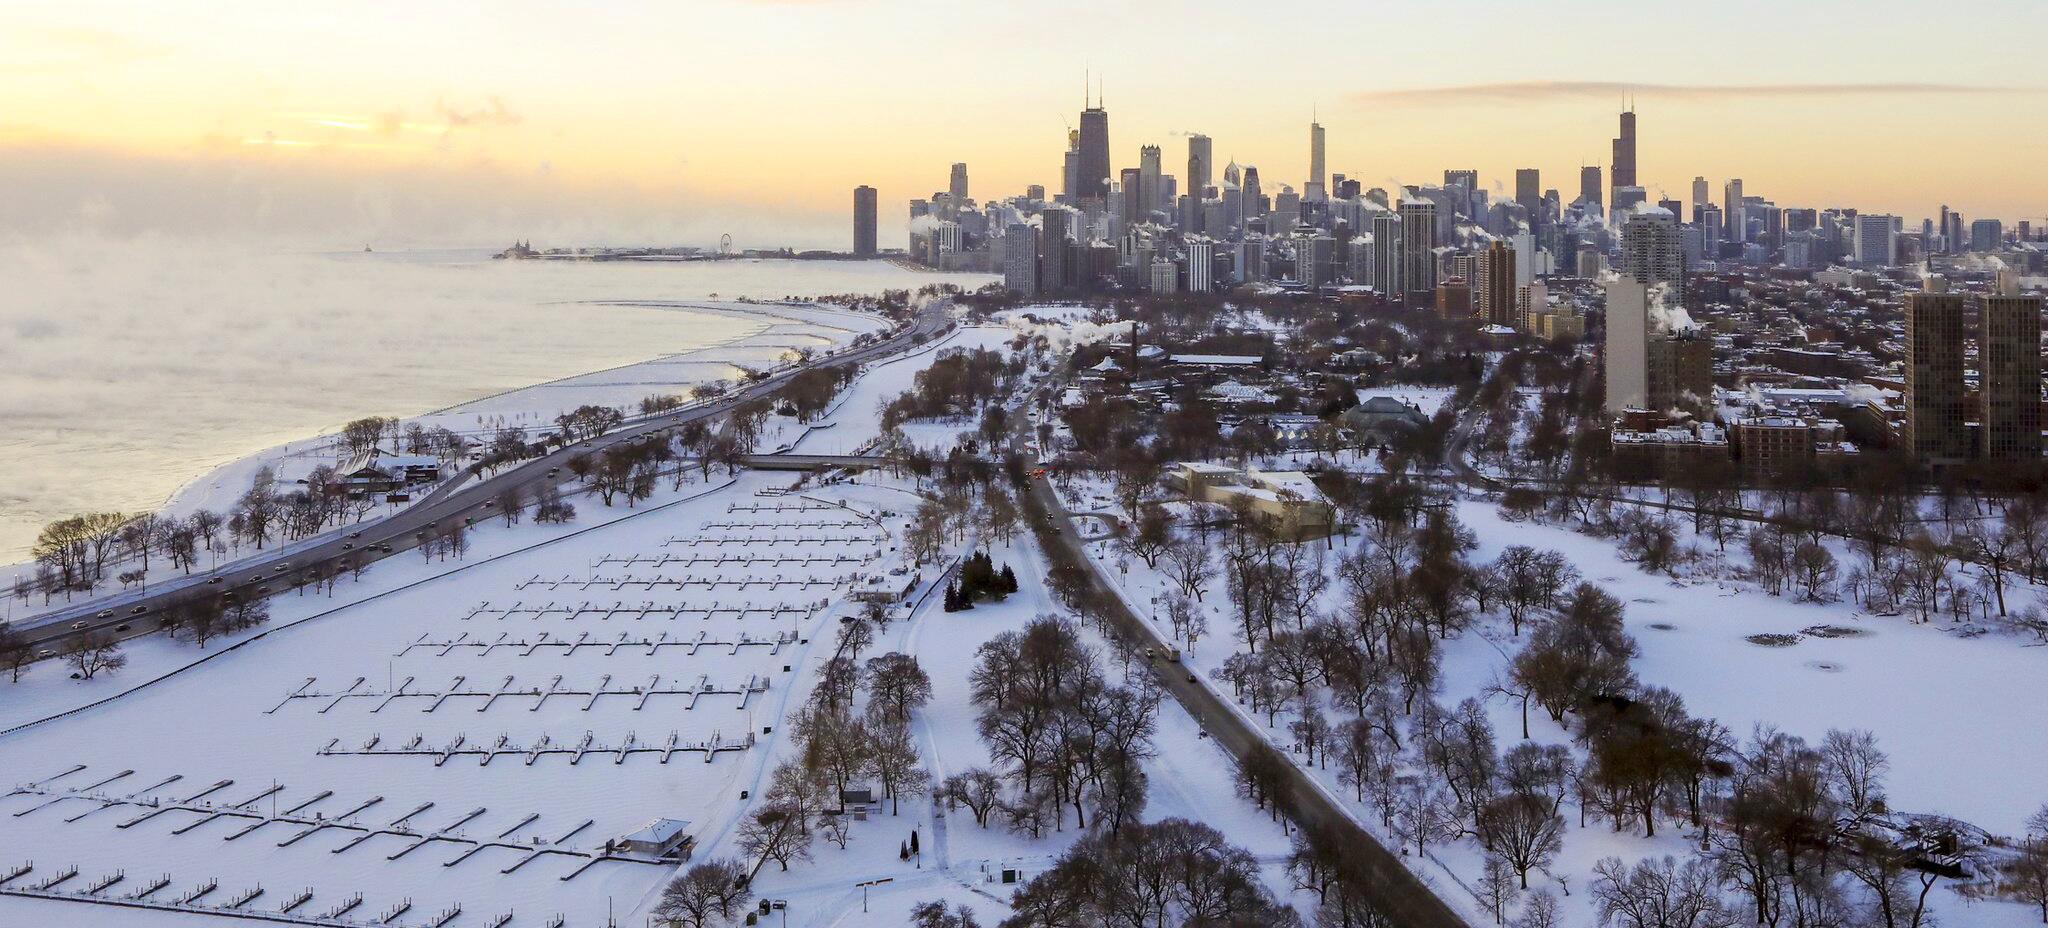 Bild zu Kältewelle in den USA